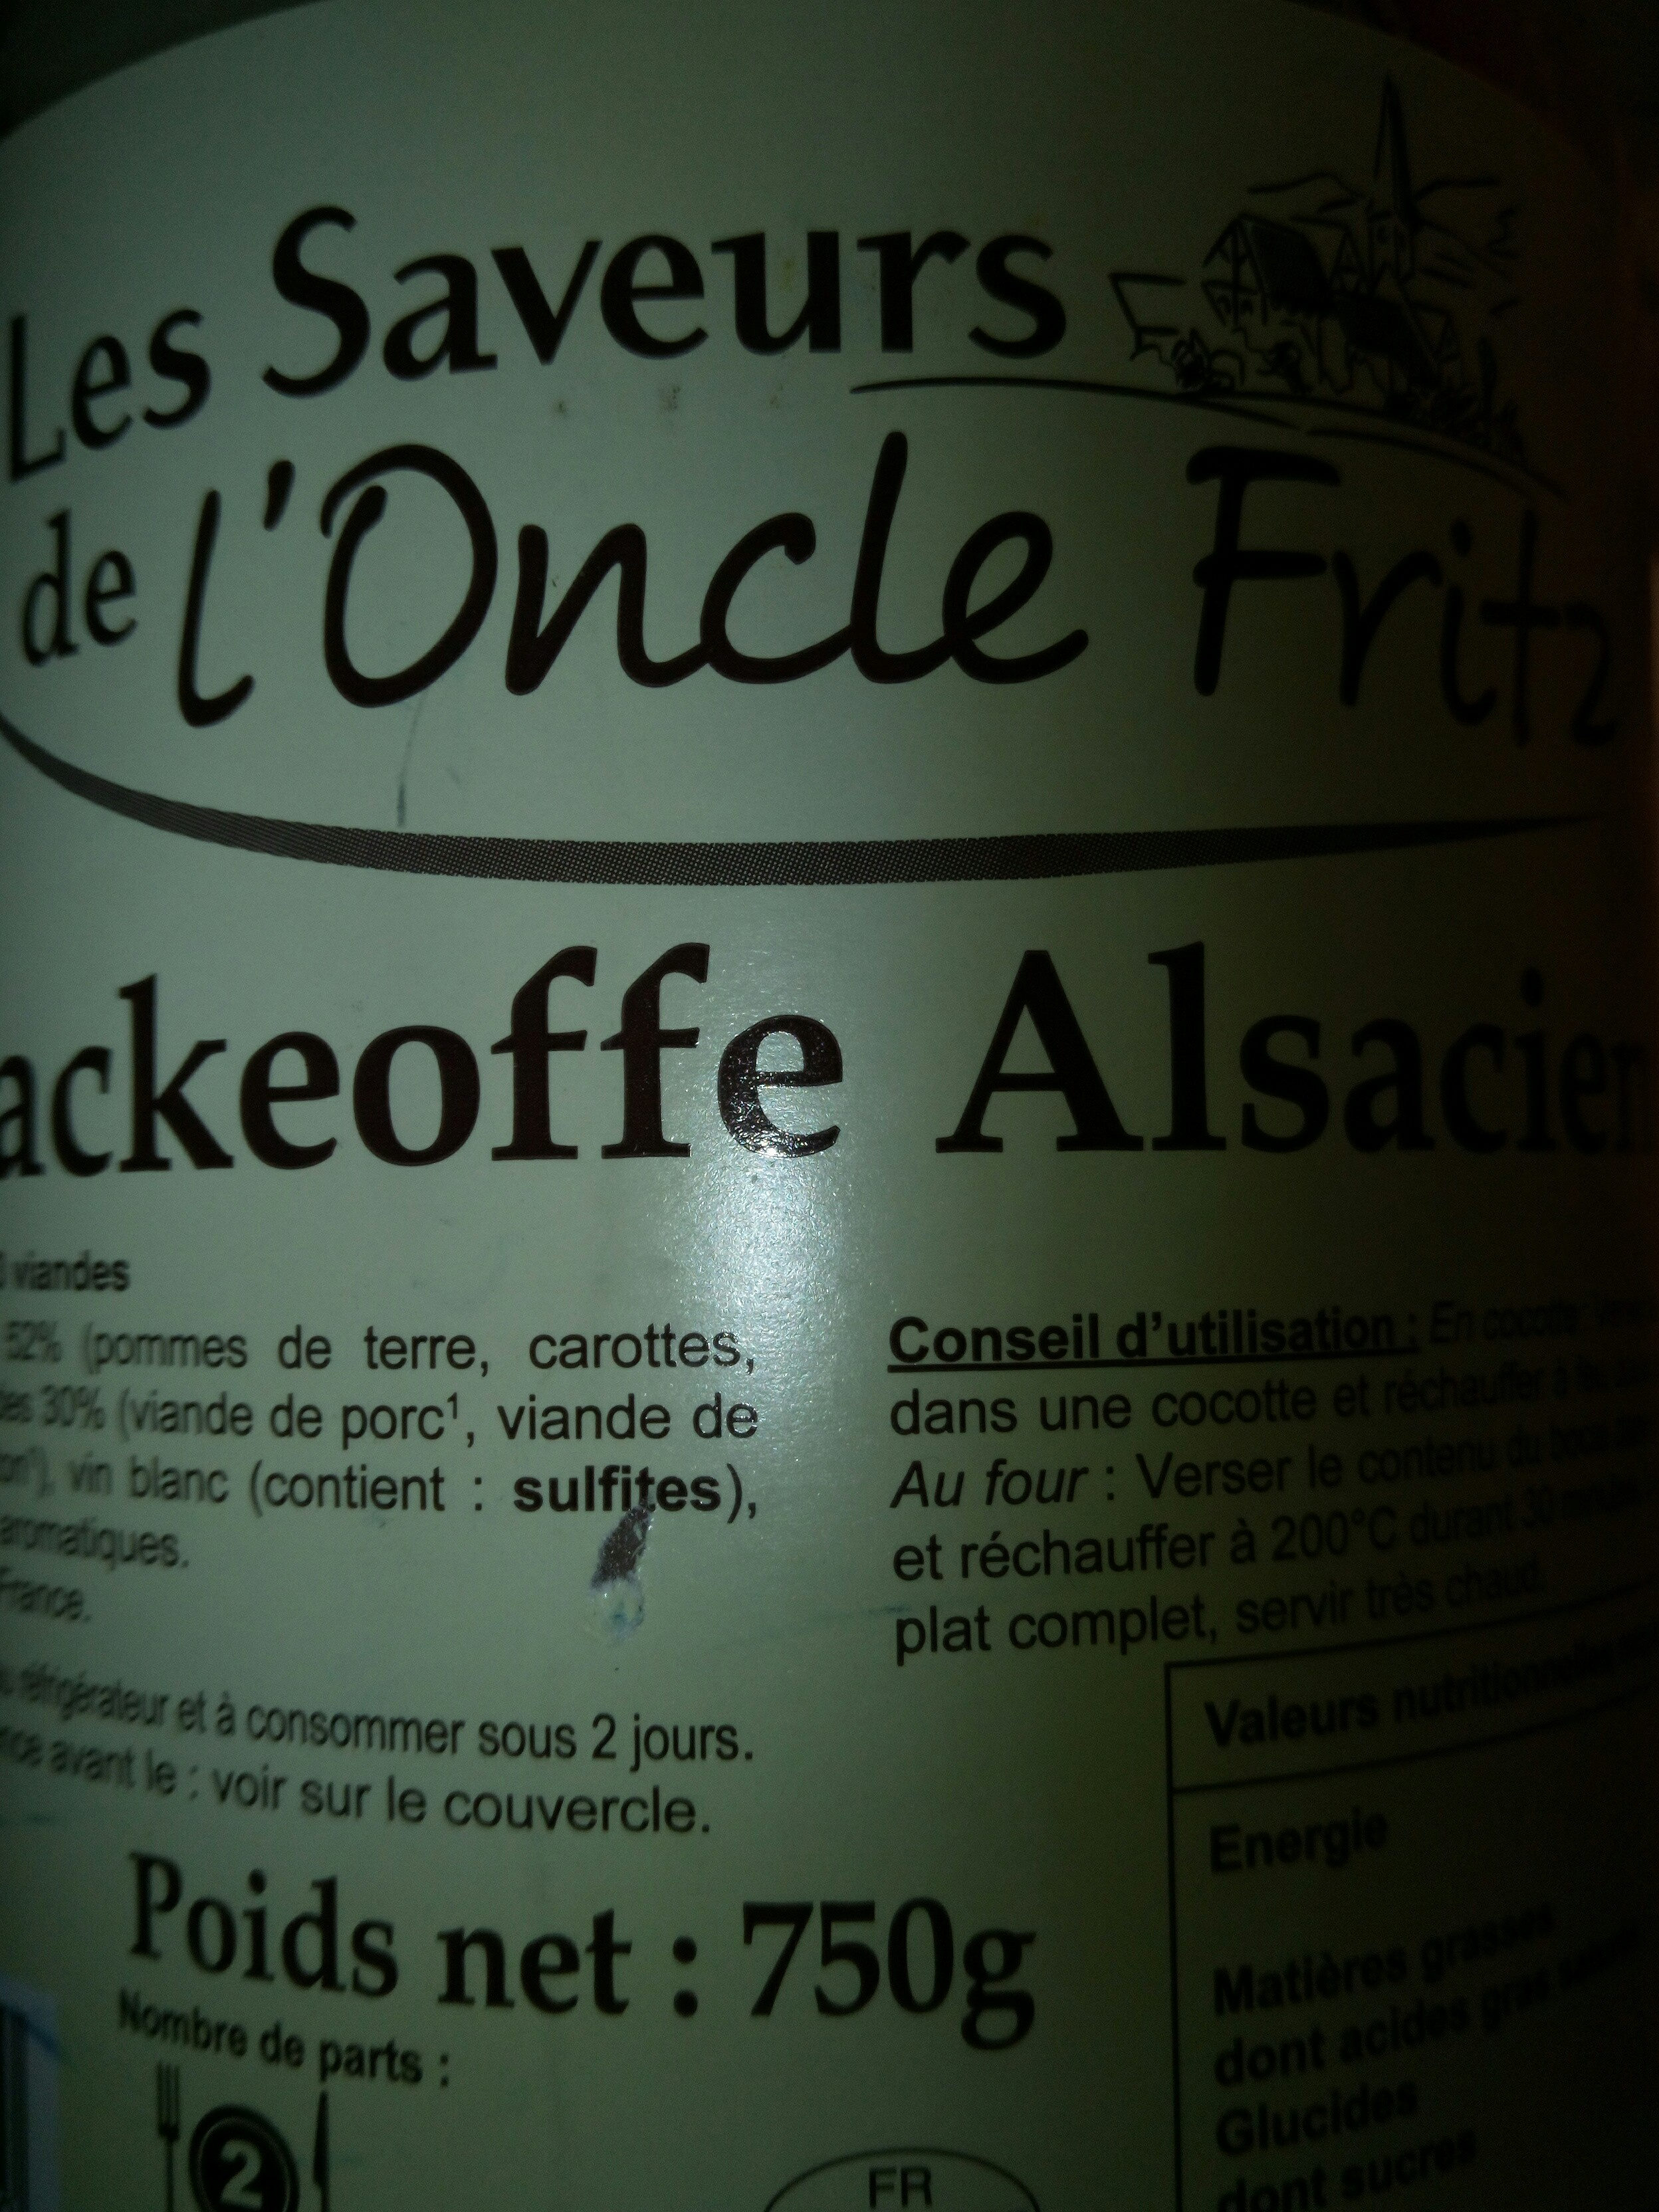 Backeoffe Alsacien - Produit